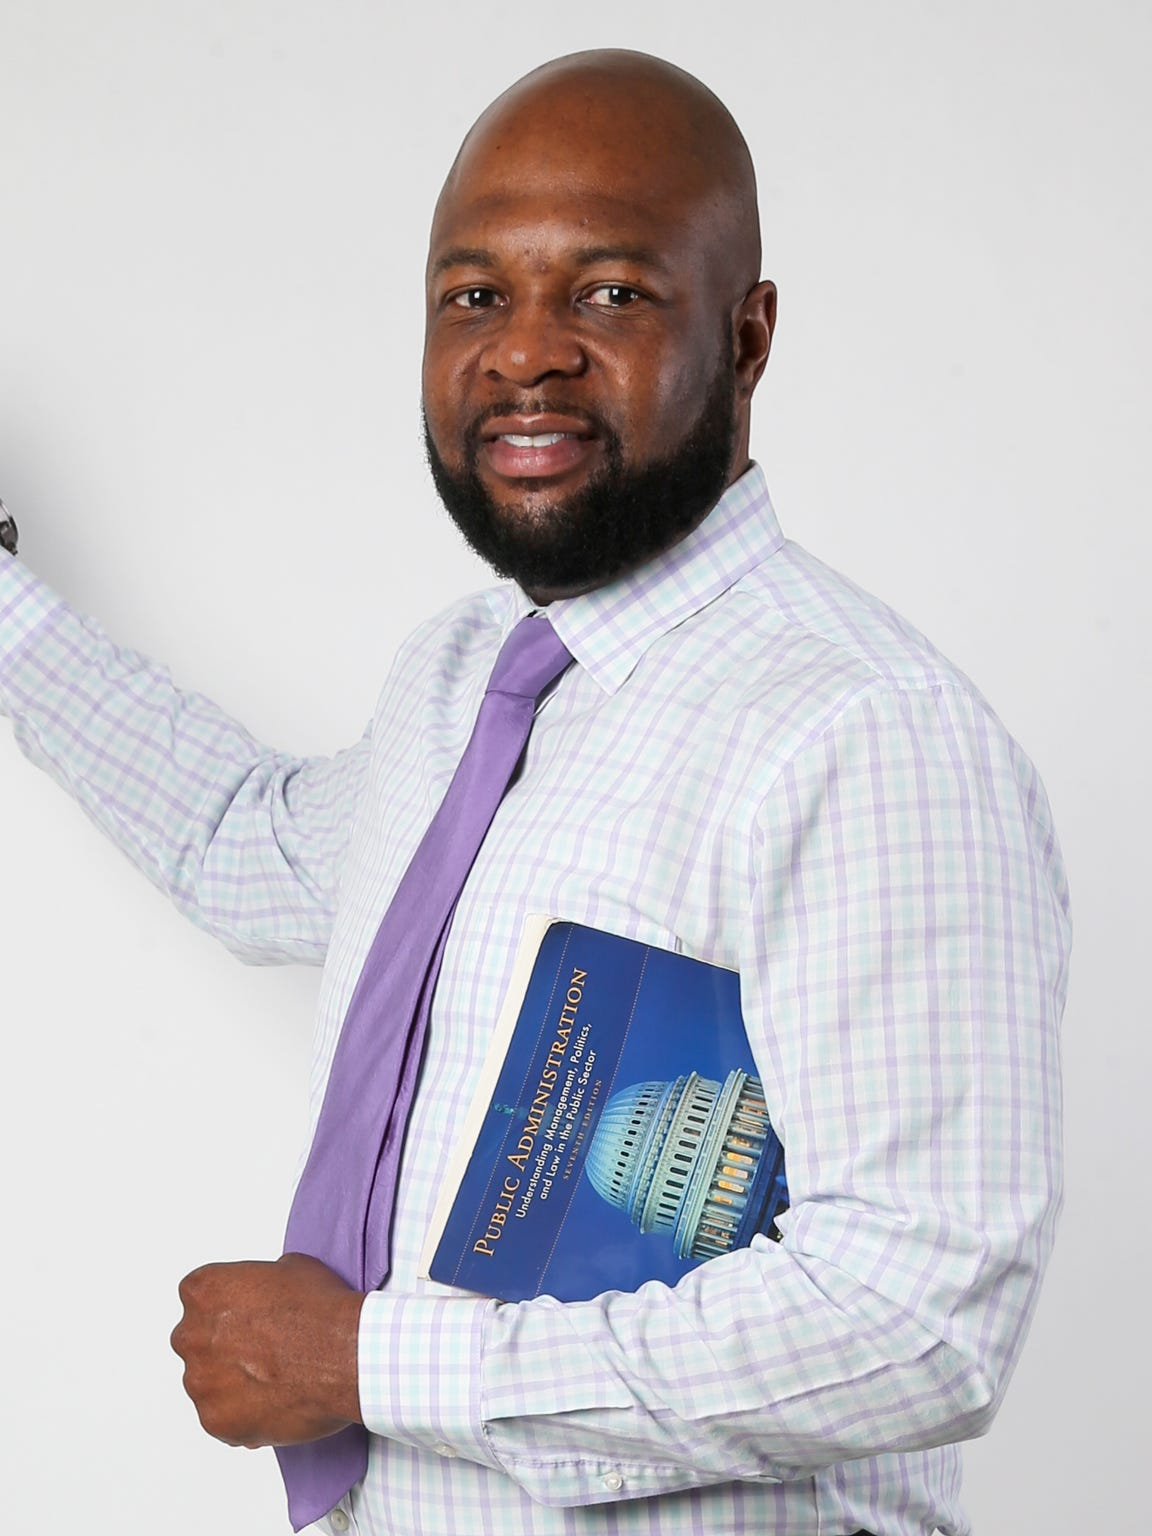 Doray Hill Jr., Assistant professor of government at